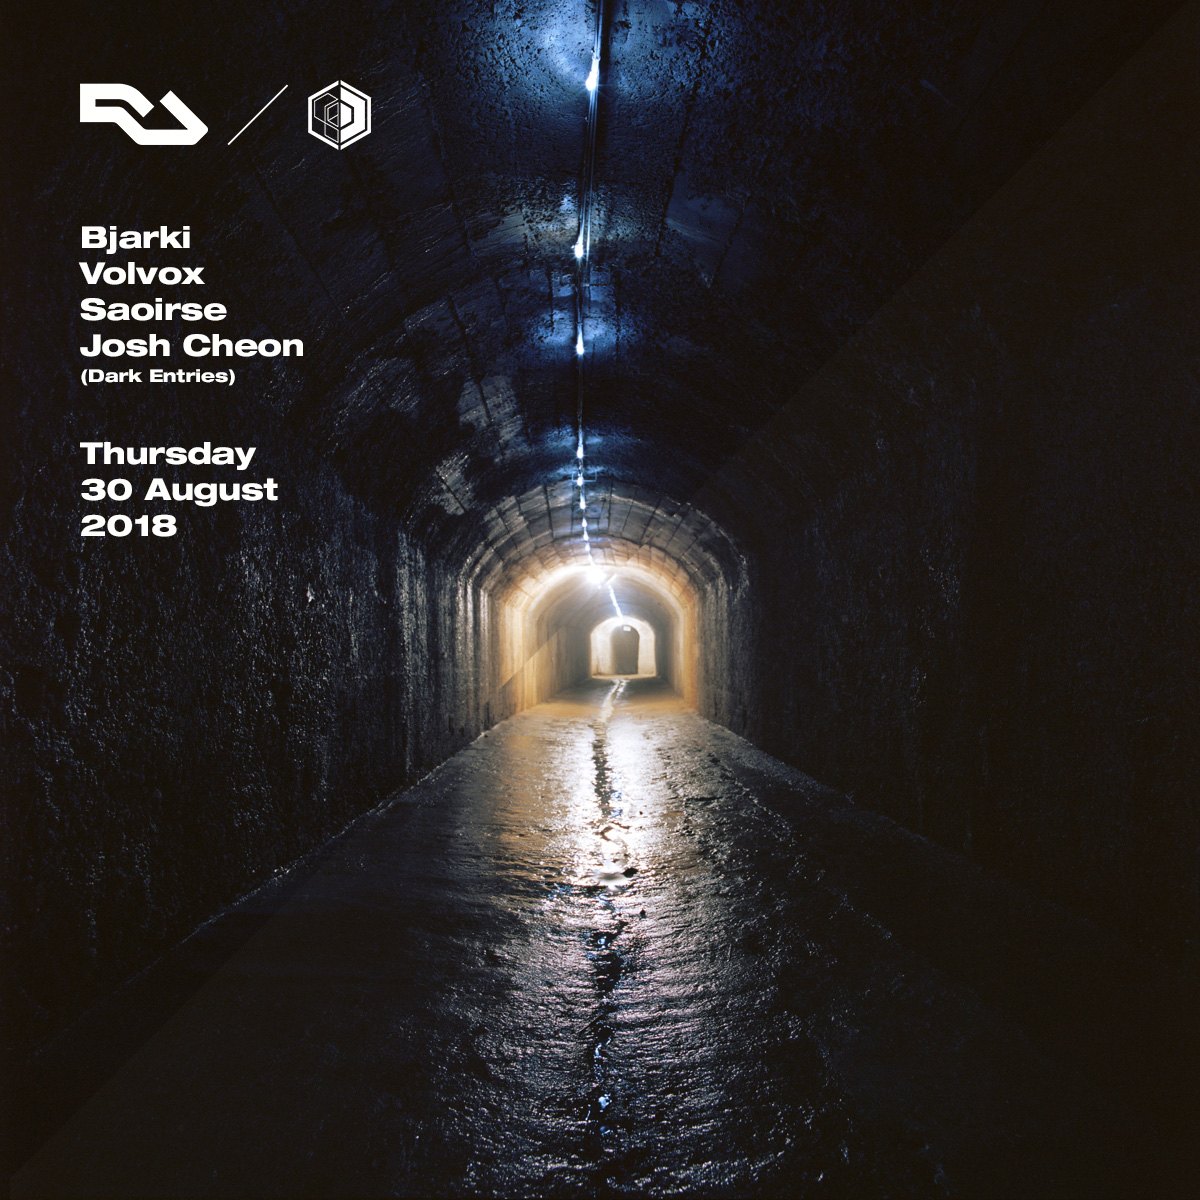 Zerostrasse : Resident Advisor x Dimensions Tunnel Party with Bjarki, Volvox, Saoirse and Josh Cheon